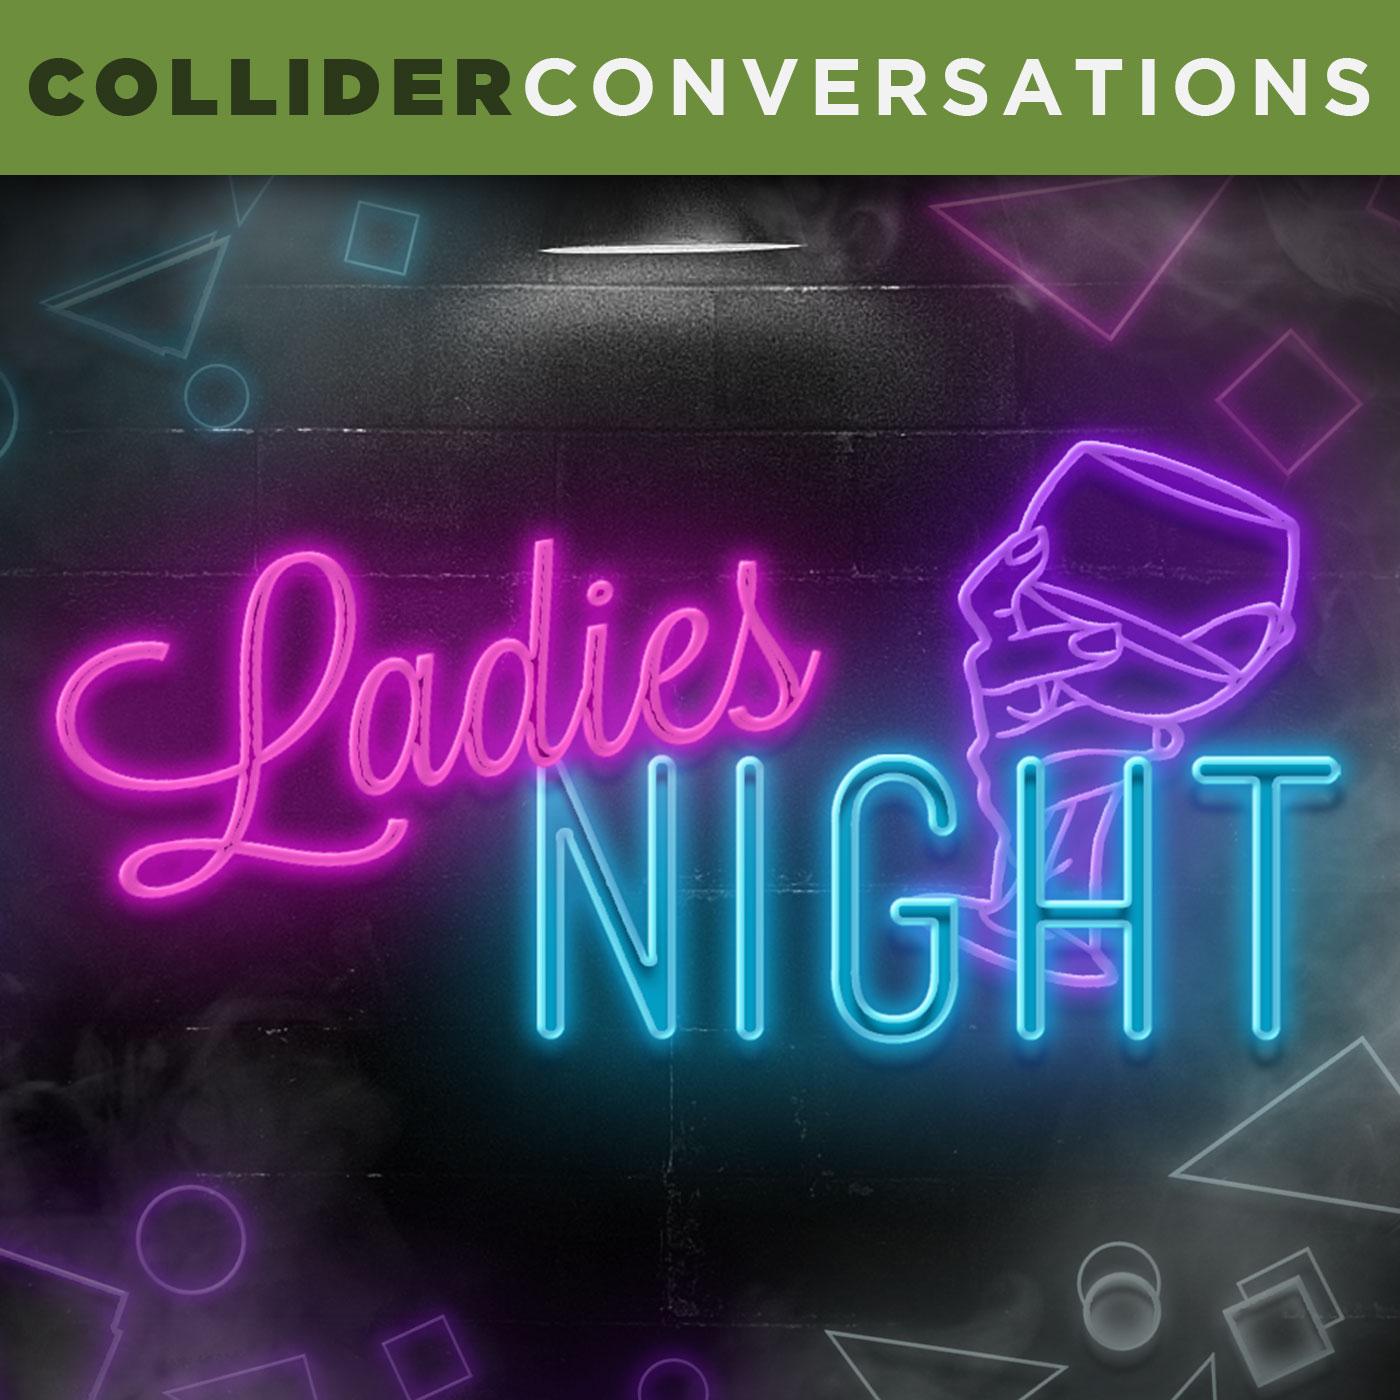 Collider Conversations